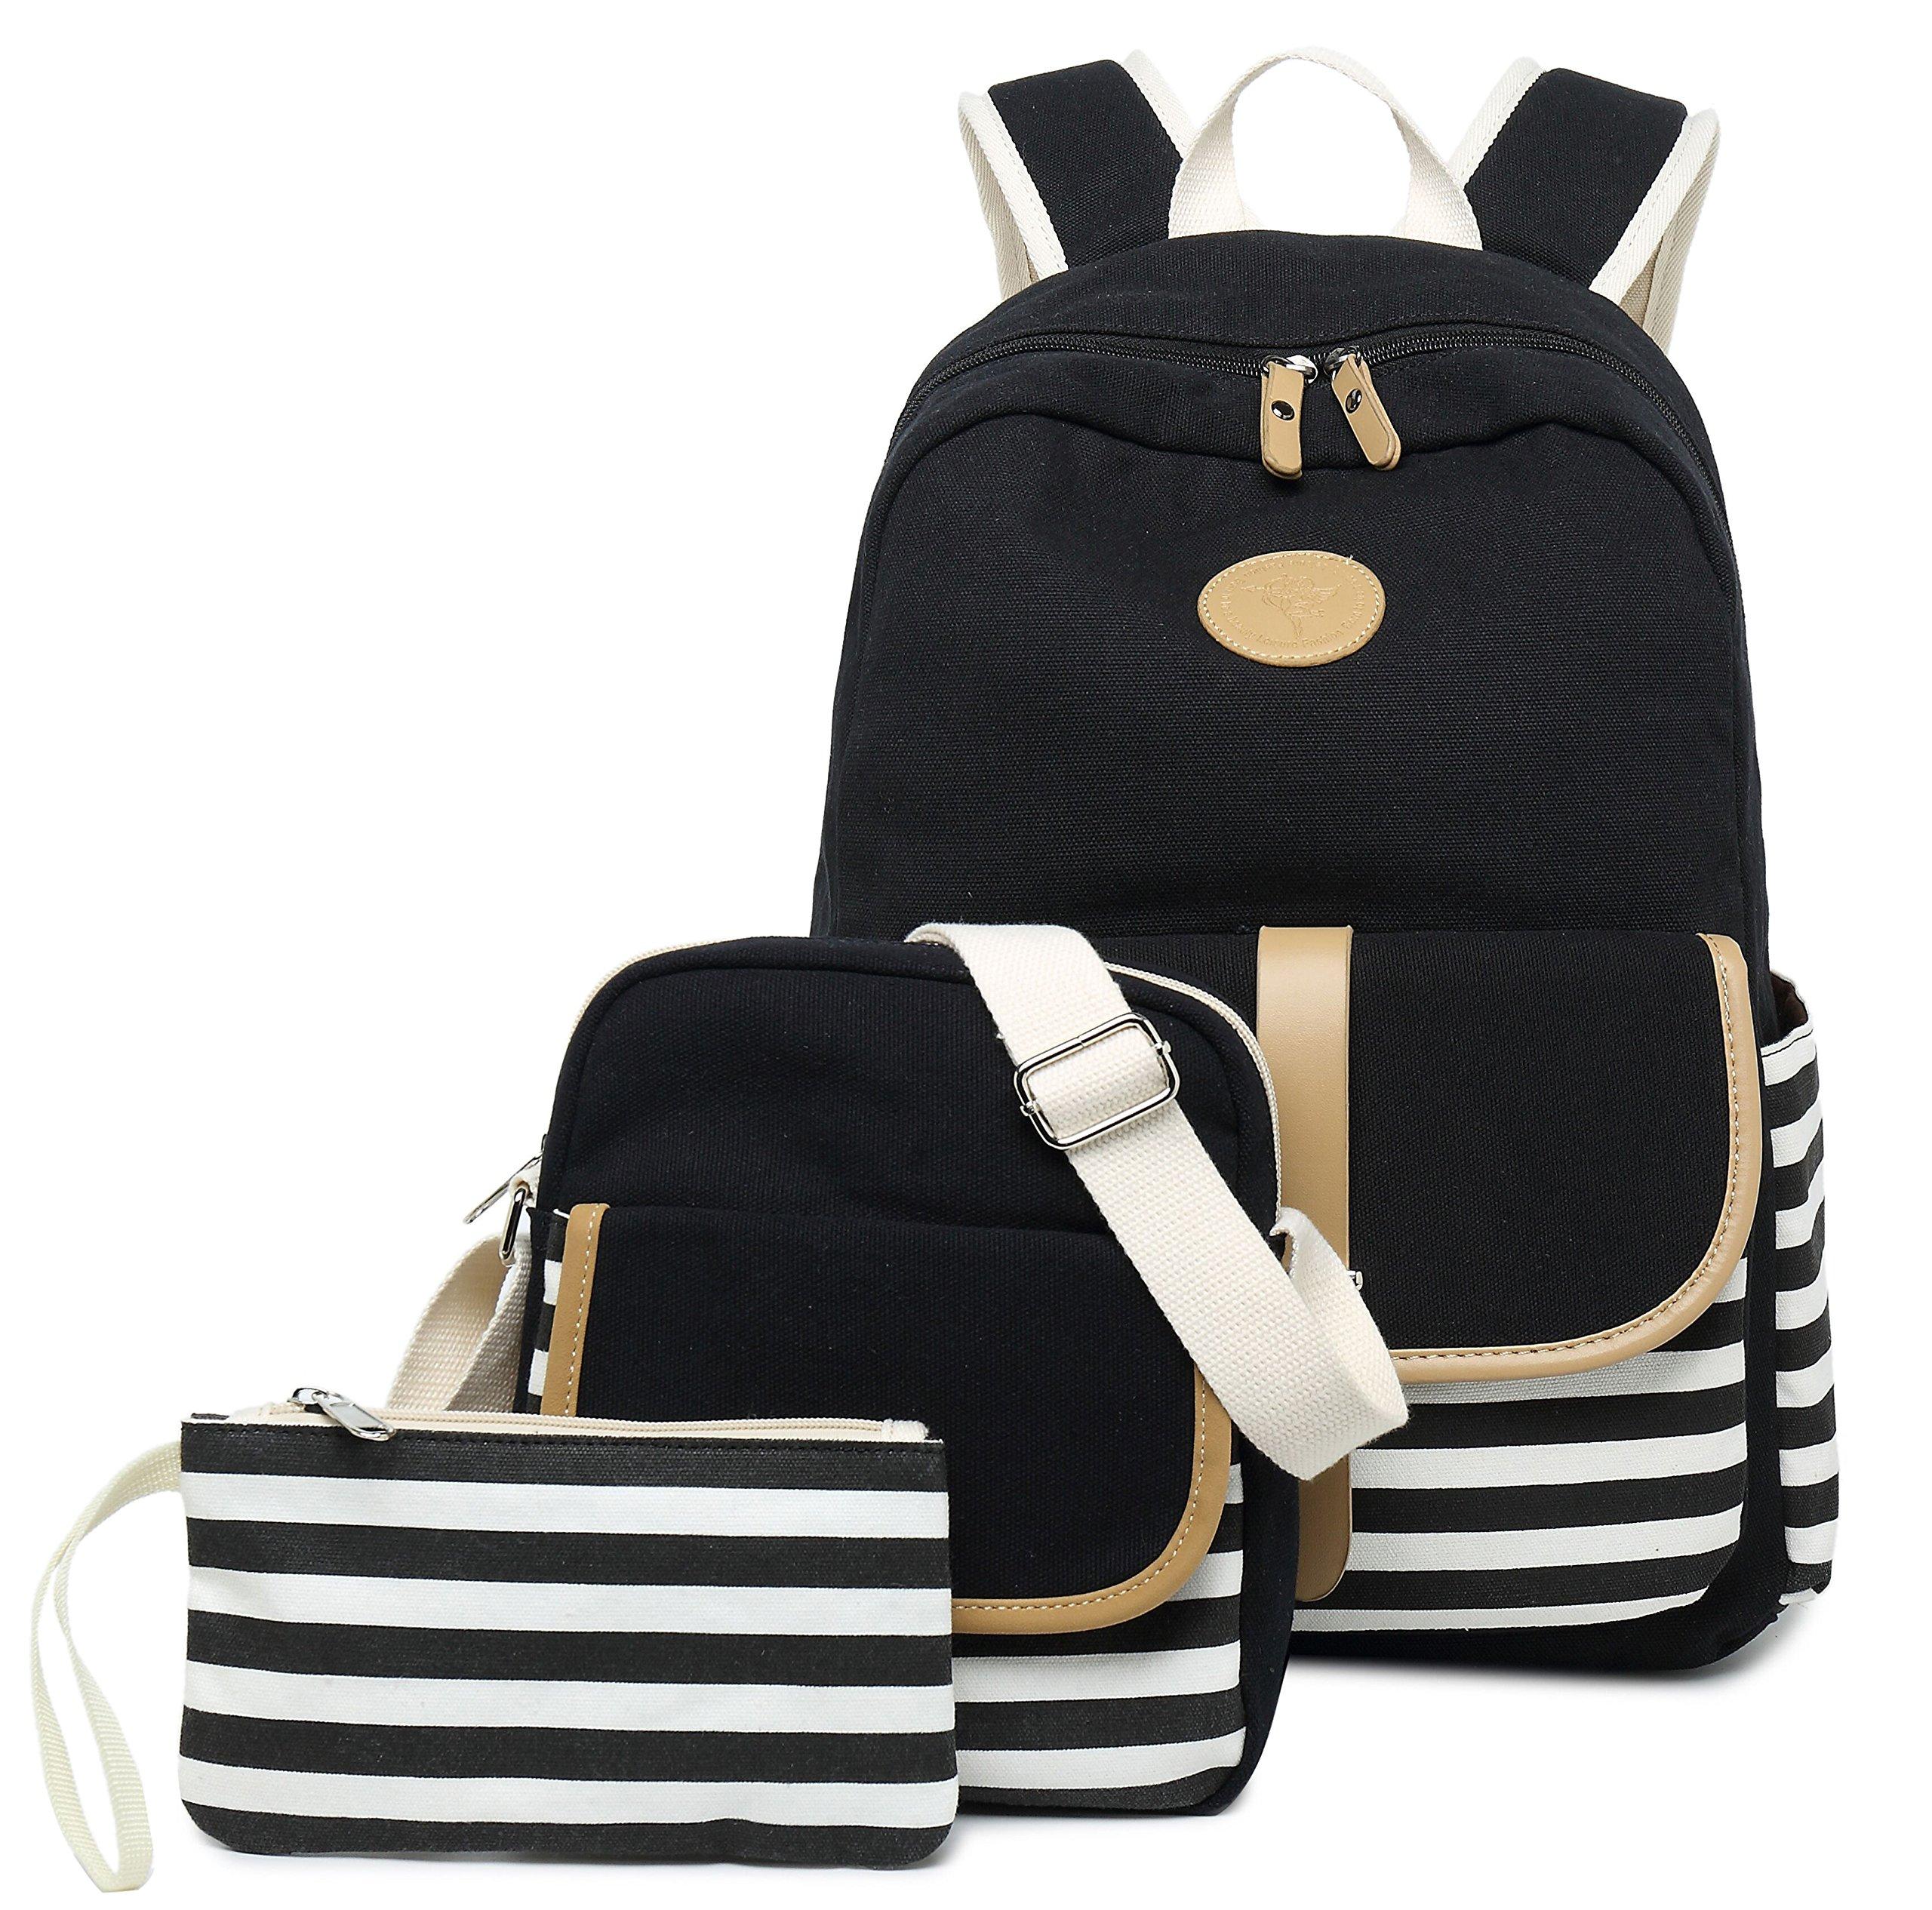 Lightweight Canvas Backpack Teens Backpack Boys and Girls School Bag Bookbags Set 3 in 1 Travel Daypack 14Inch Laptop Backpack, Black